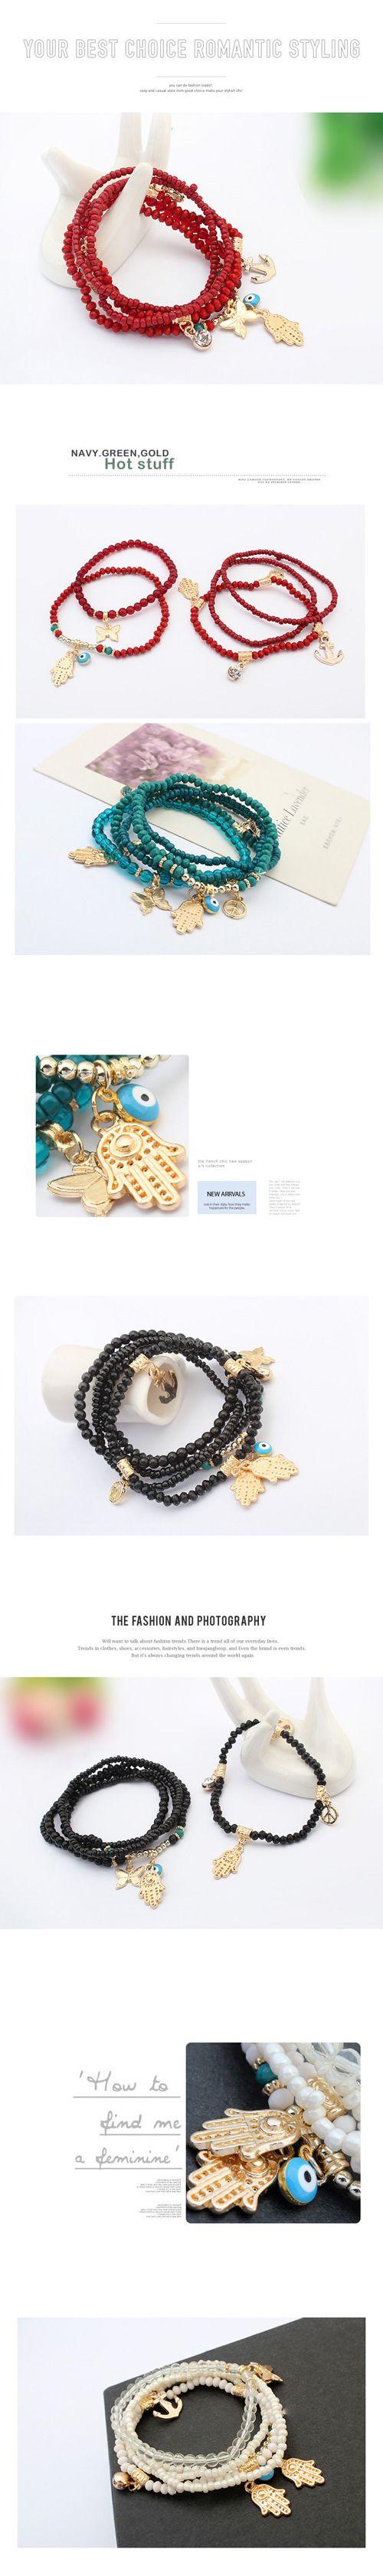 Wholesale corazón clásico brazalete de múltiples capas occidente del Buda de la moda (roja) | Callesetas